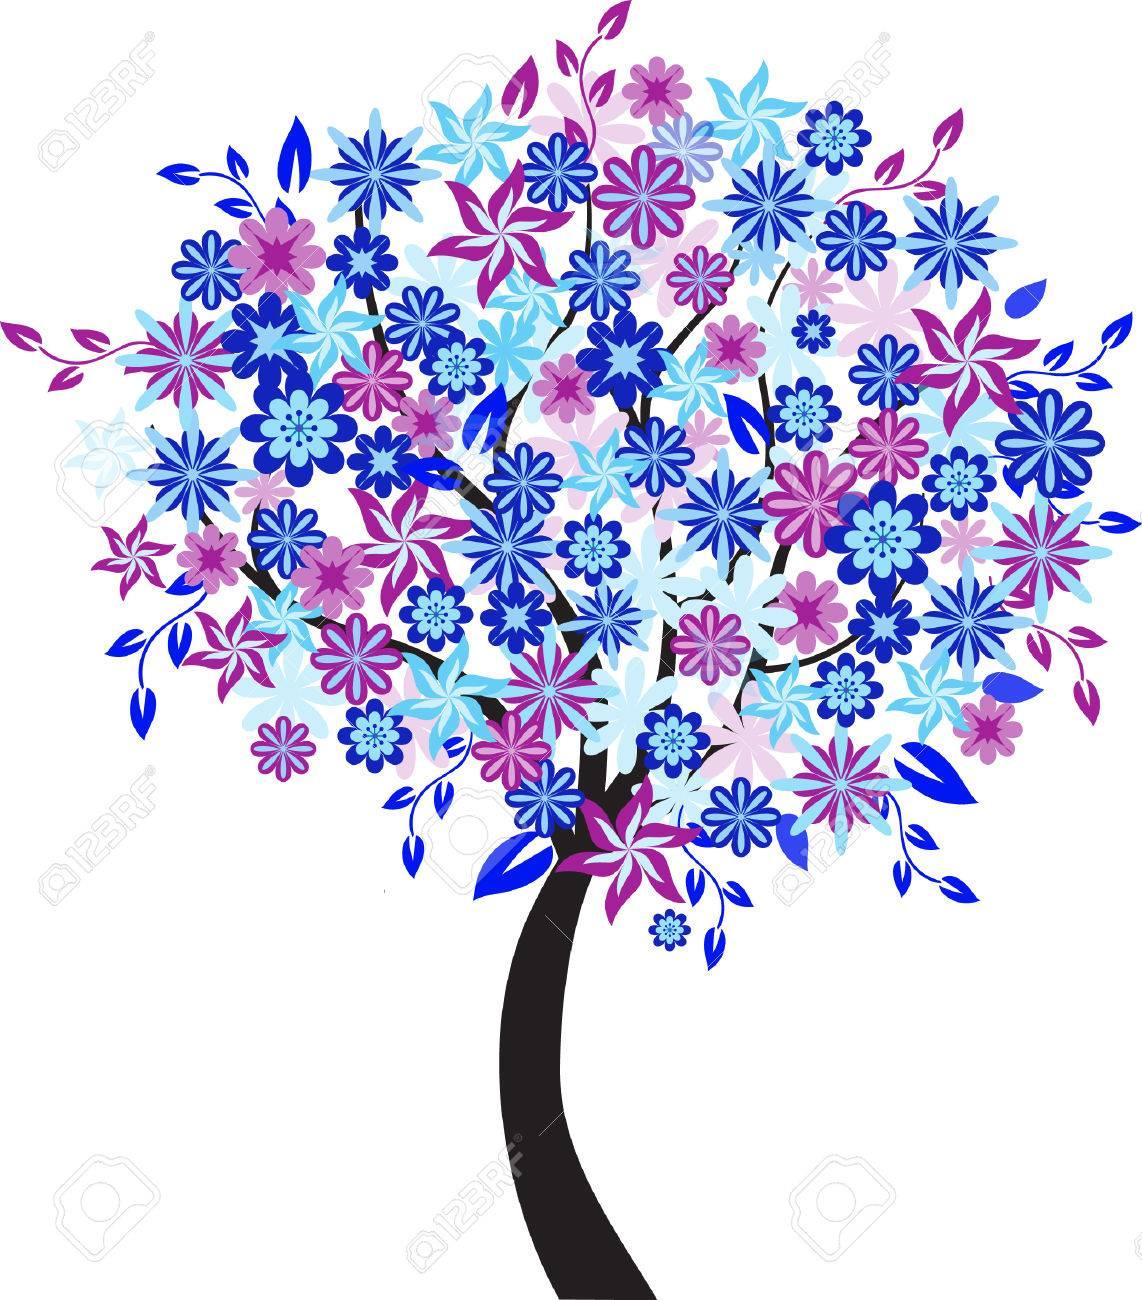 Png Clipart Clip Art Purple Tree